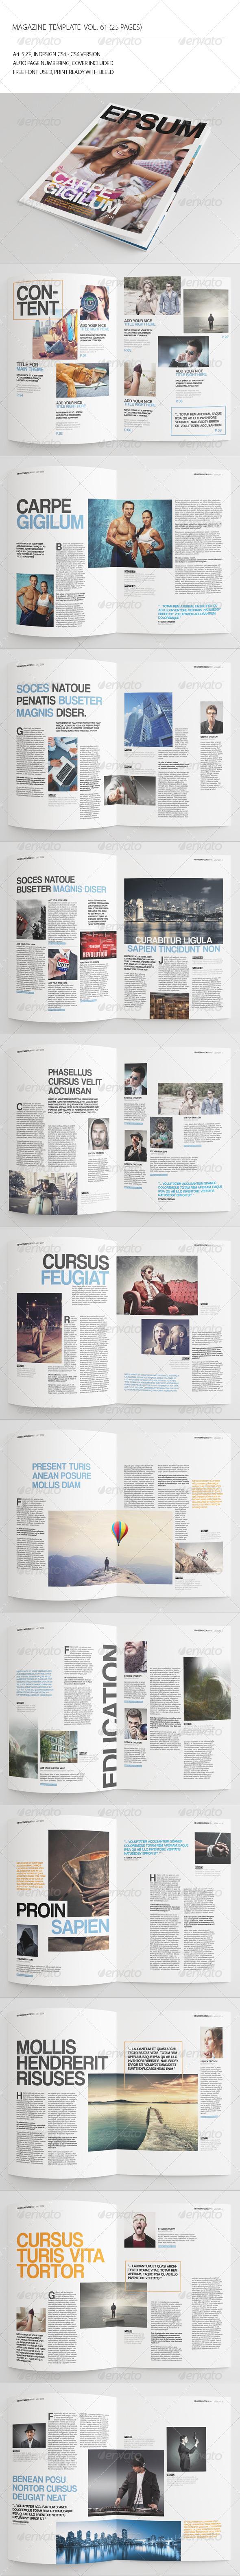 GraphicRiver 25 Pages Simple Magazine Vol61 7811215